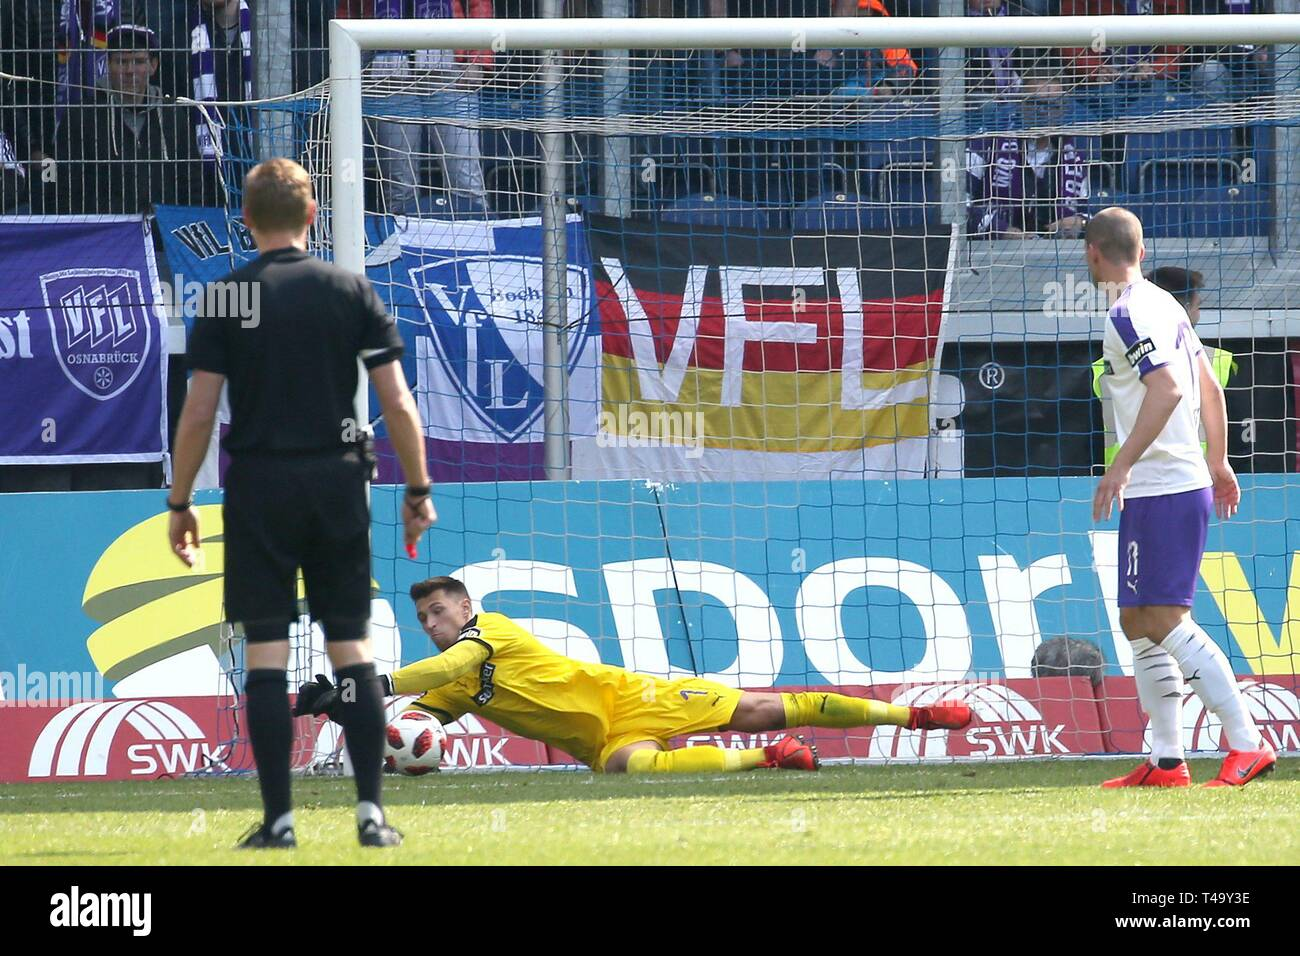 firo: 14.04.2019 Football, 3. Bundesliga, season 2018/2019 KFC Uerdingen 05 - VfL OsnabrÃ_ck goalkeeper Nils Körber (# 1, VfL OsnabrÃ_ck) Single action | usage worldwide - Stock Image